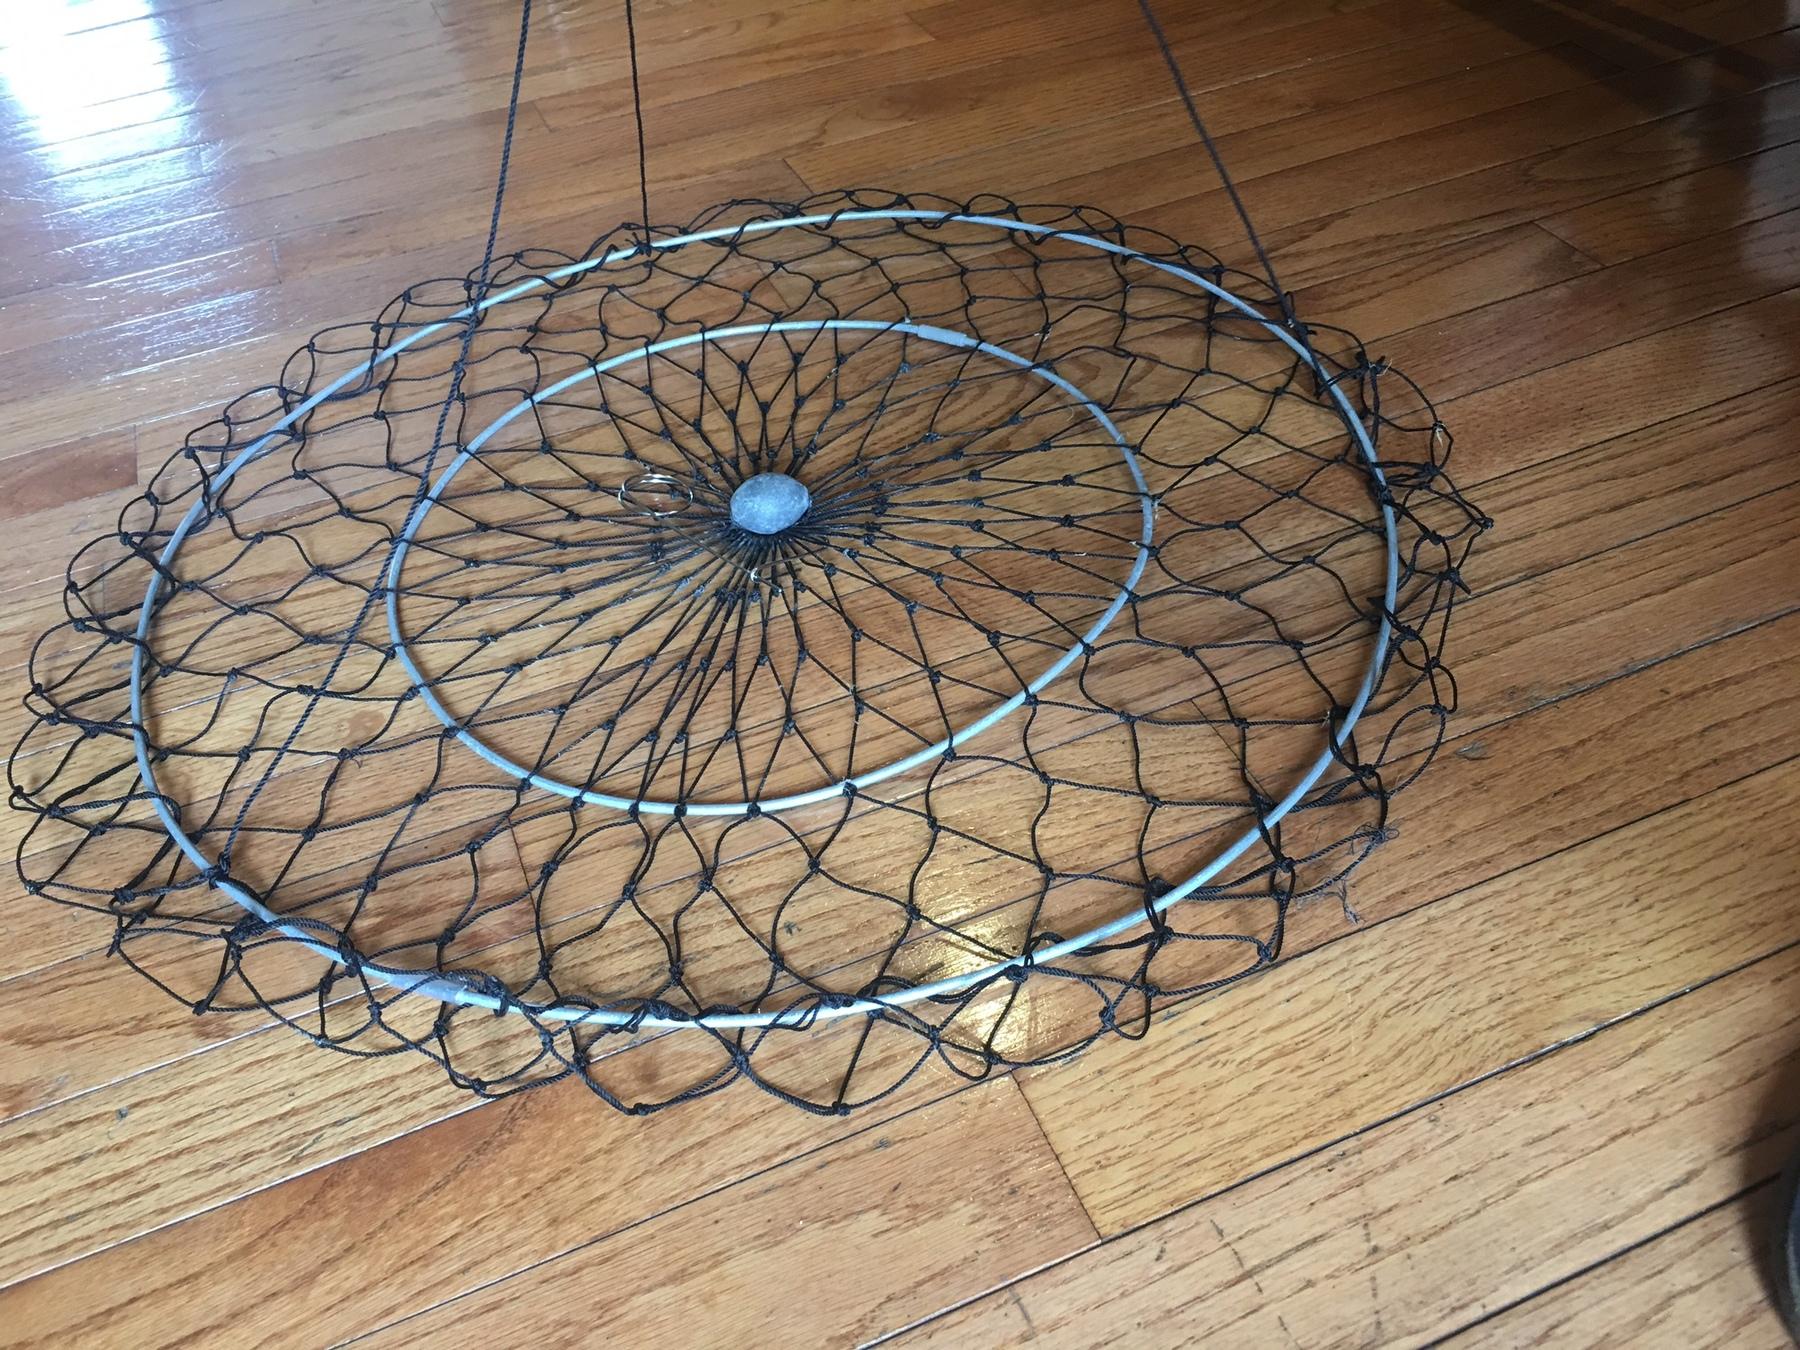 Ring trap 3.jpg